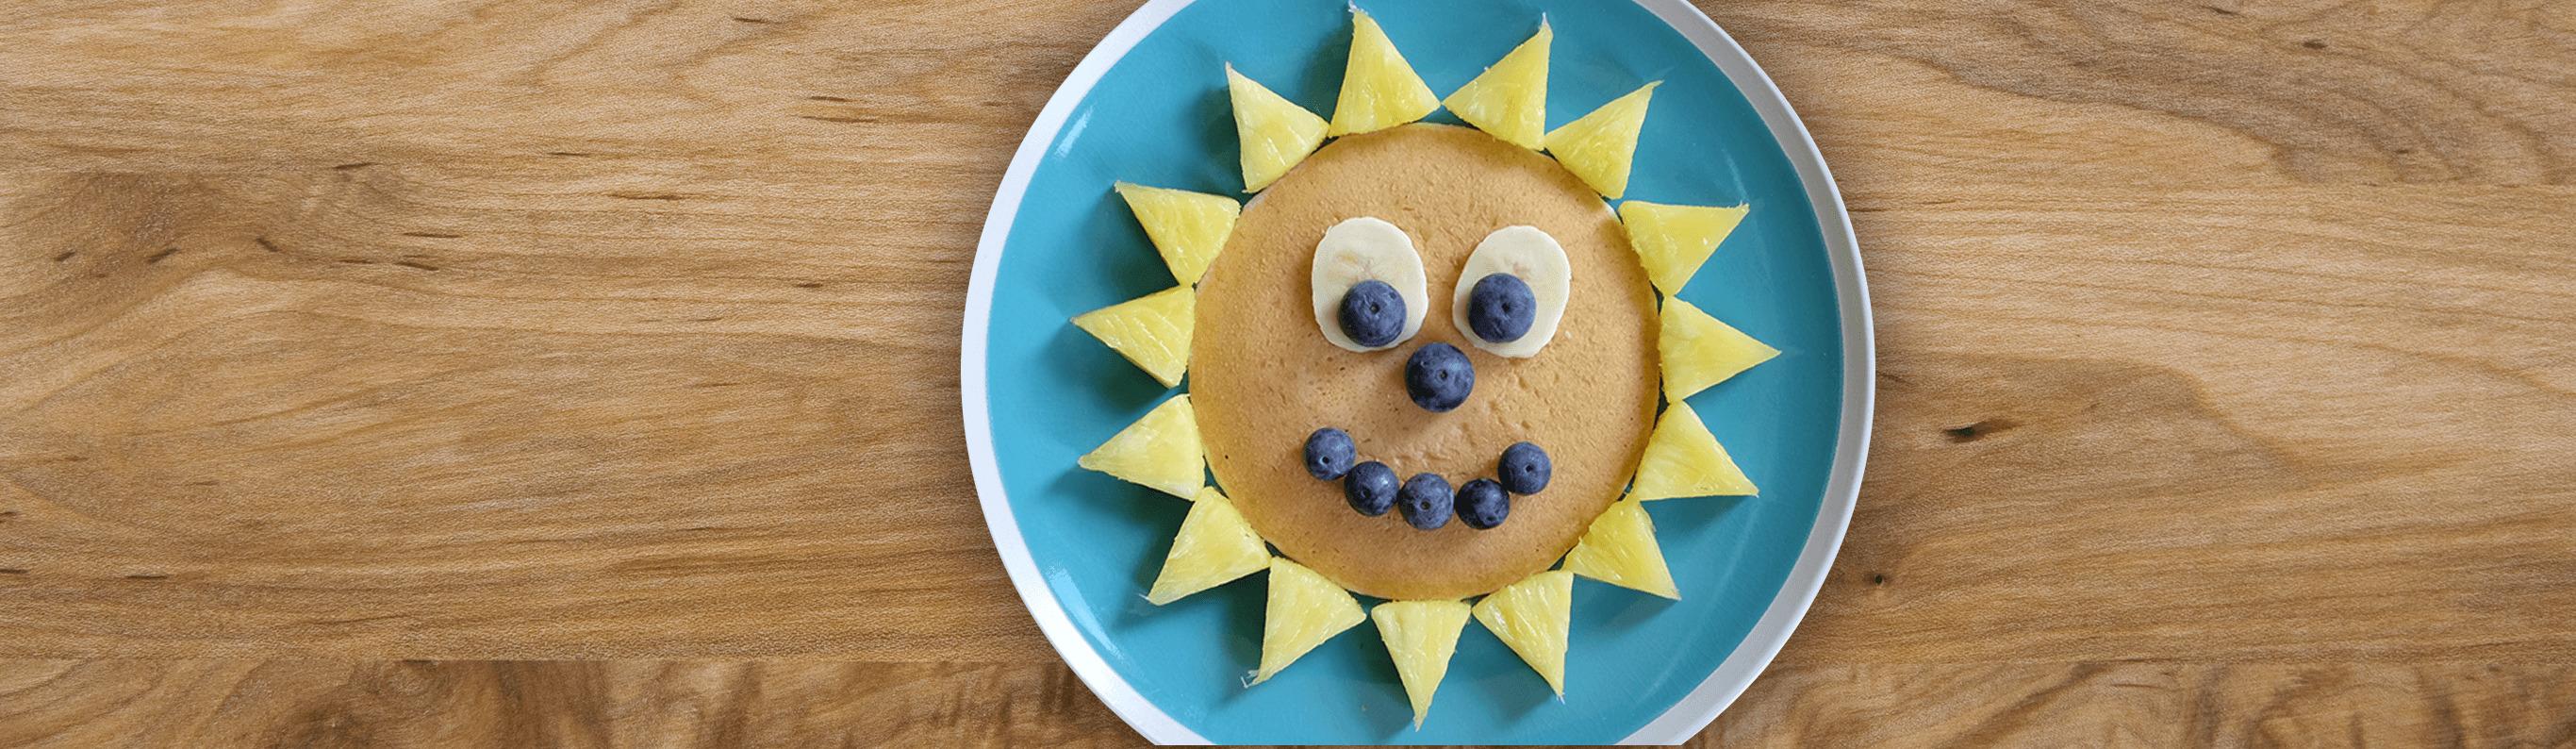 Sunshine Pancakes